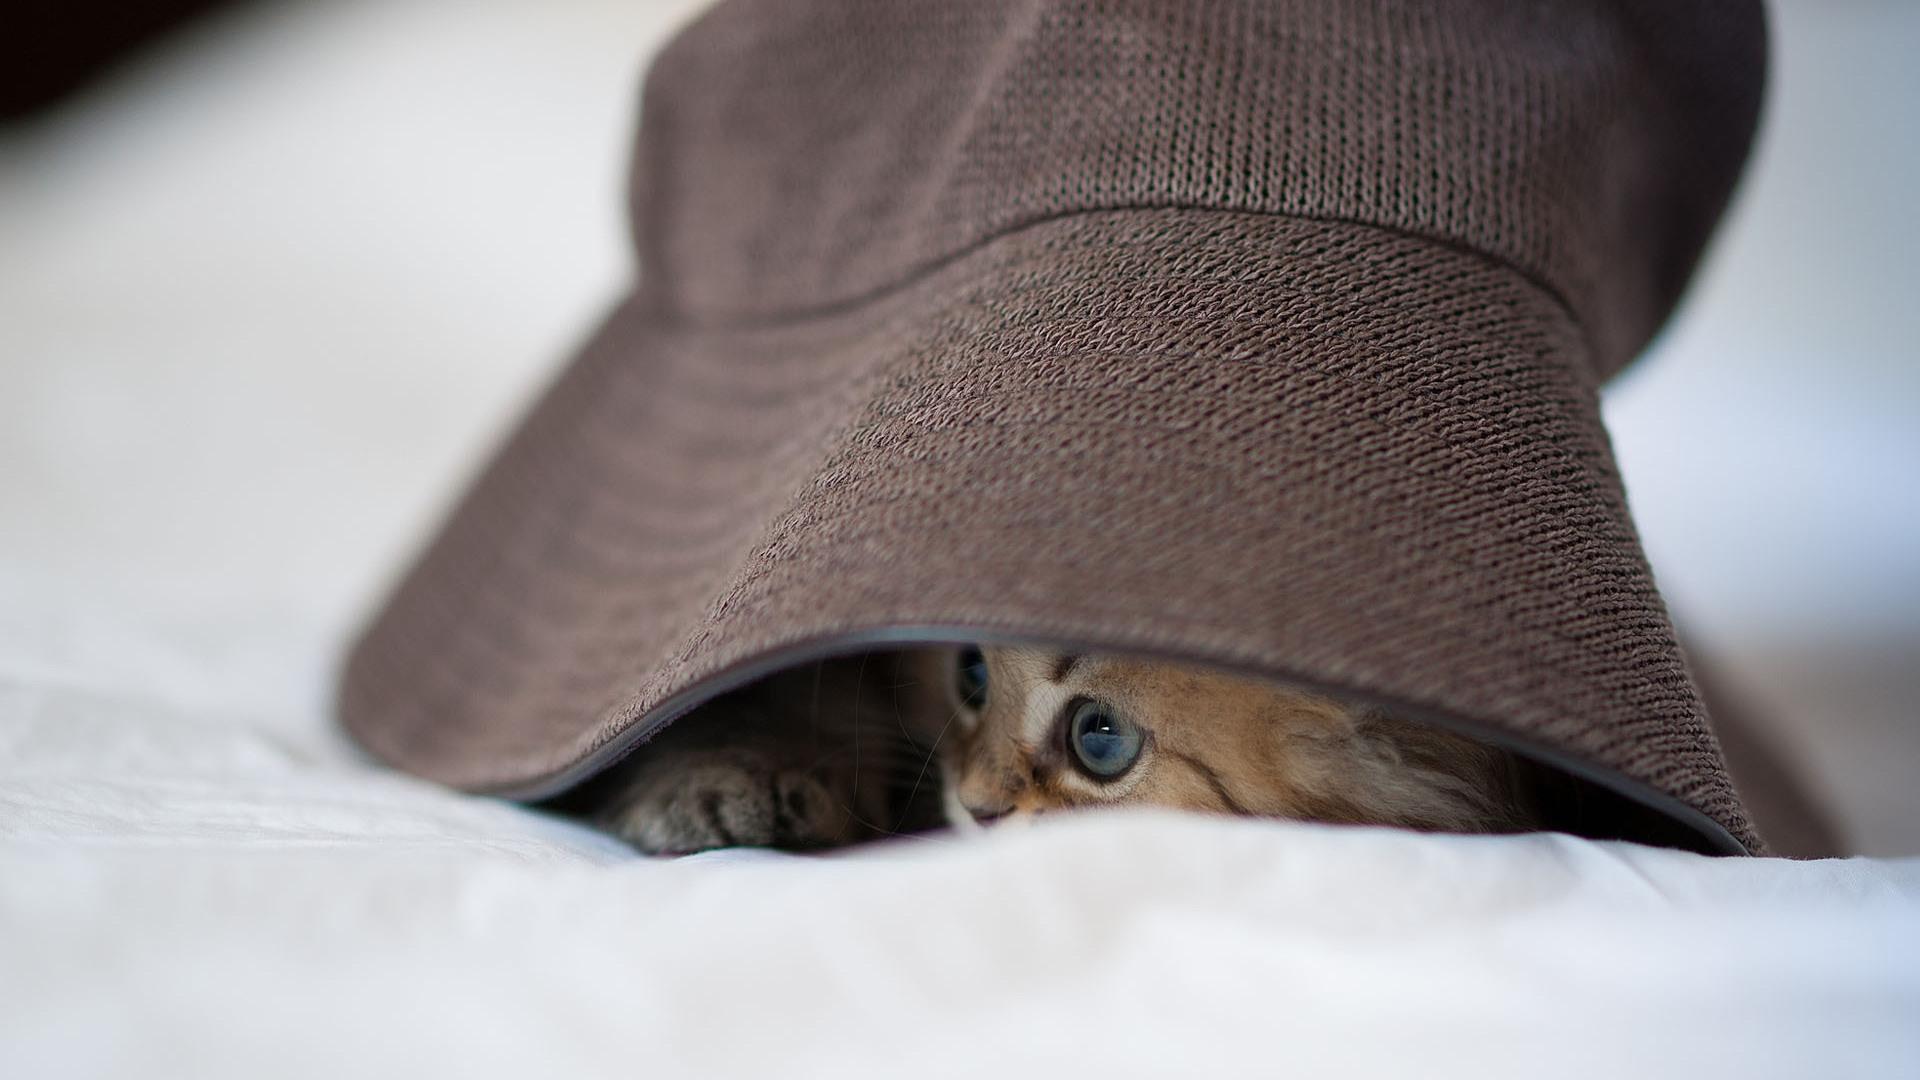 Wallpaper White Cat Eyes Glasses Hat Brown Nose Skin